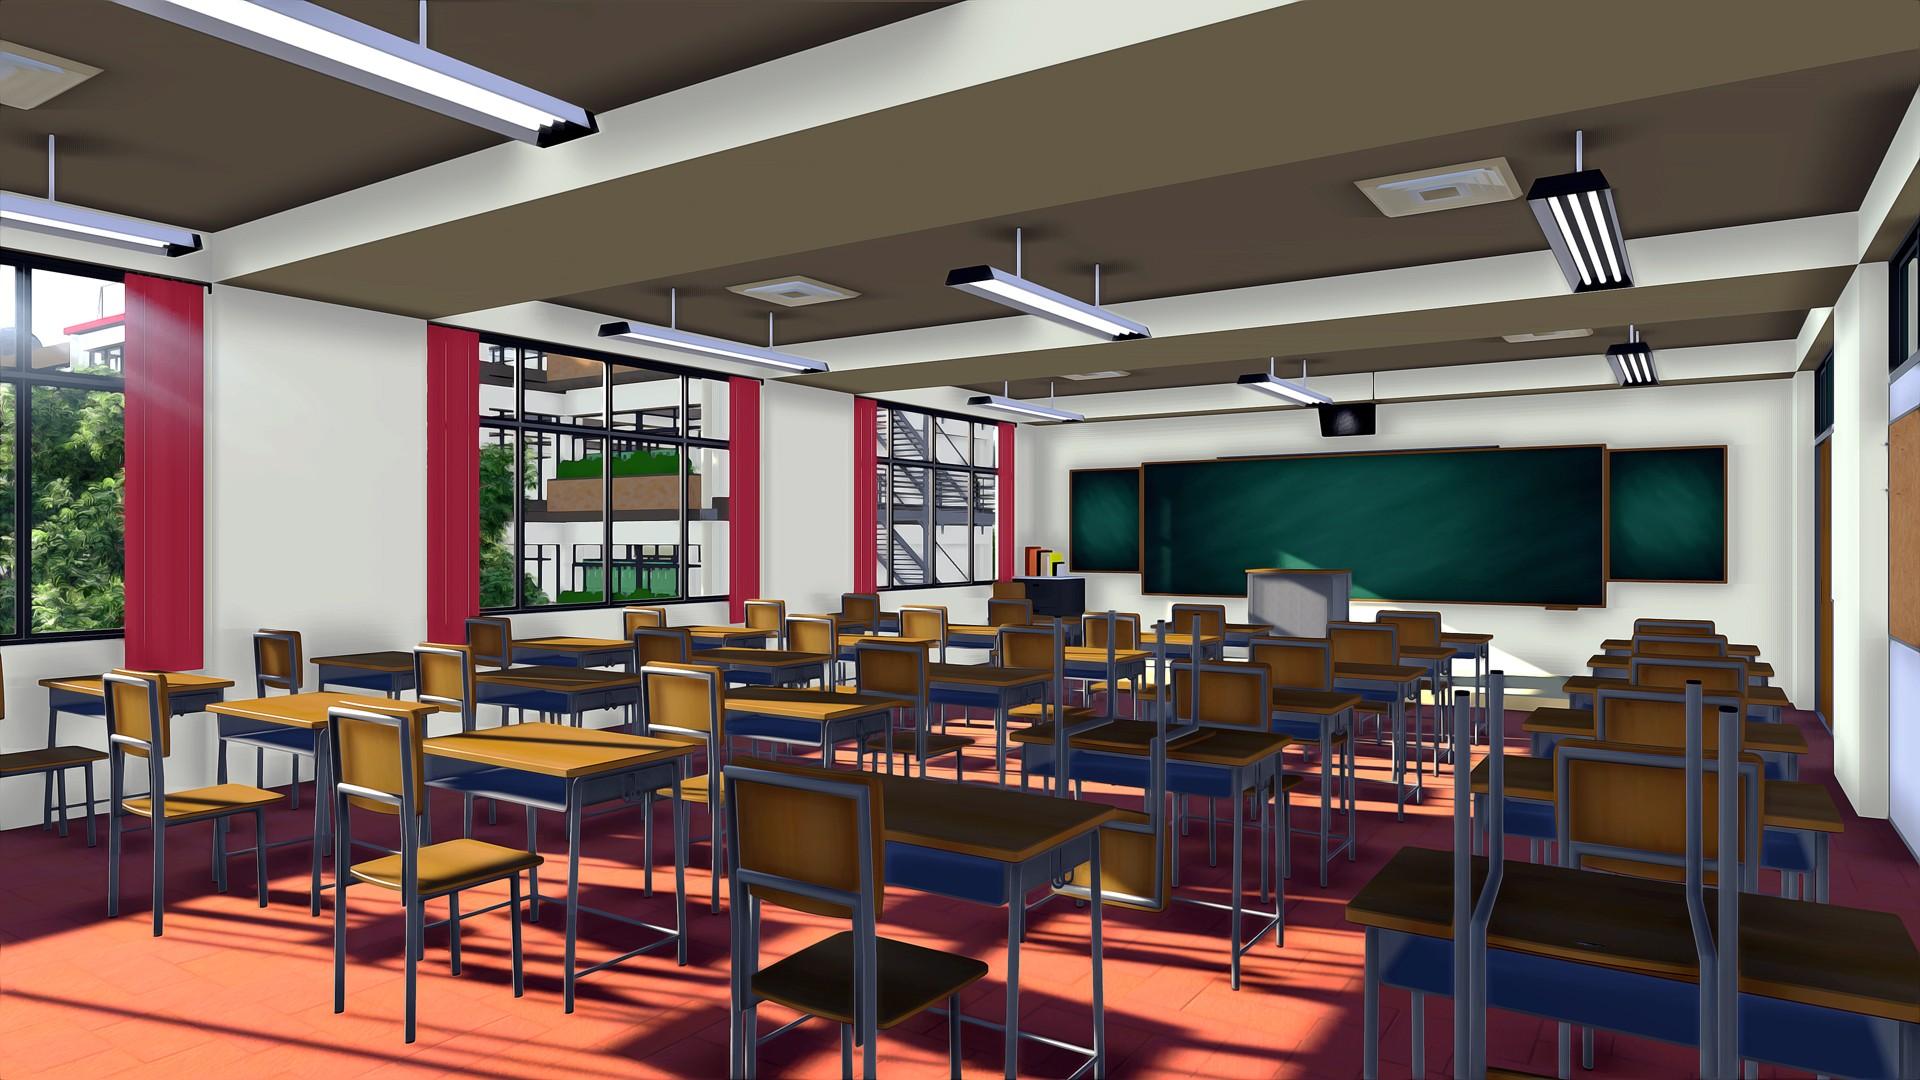 Classroom background  Download free beautiful full HD